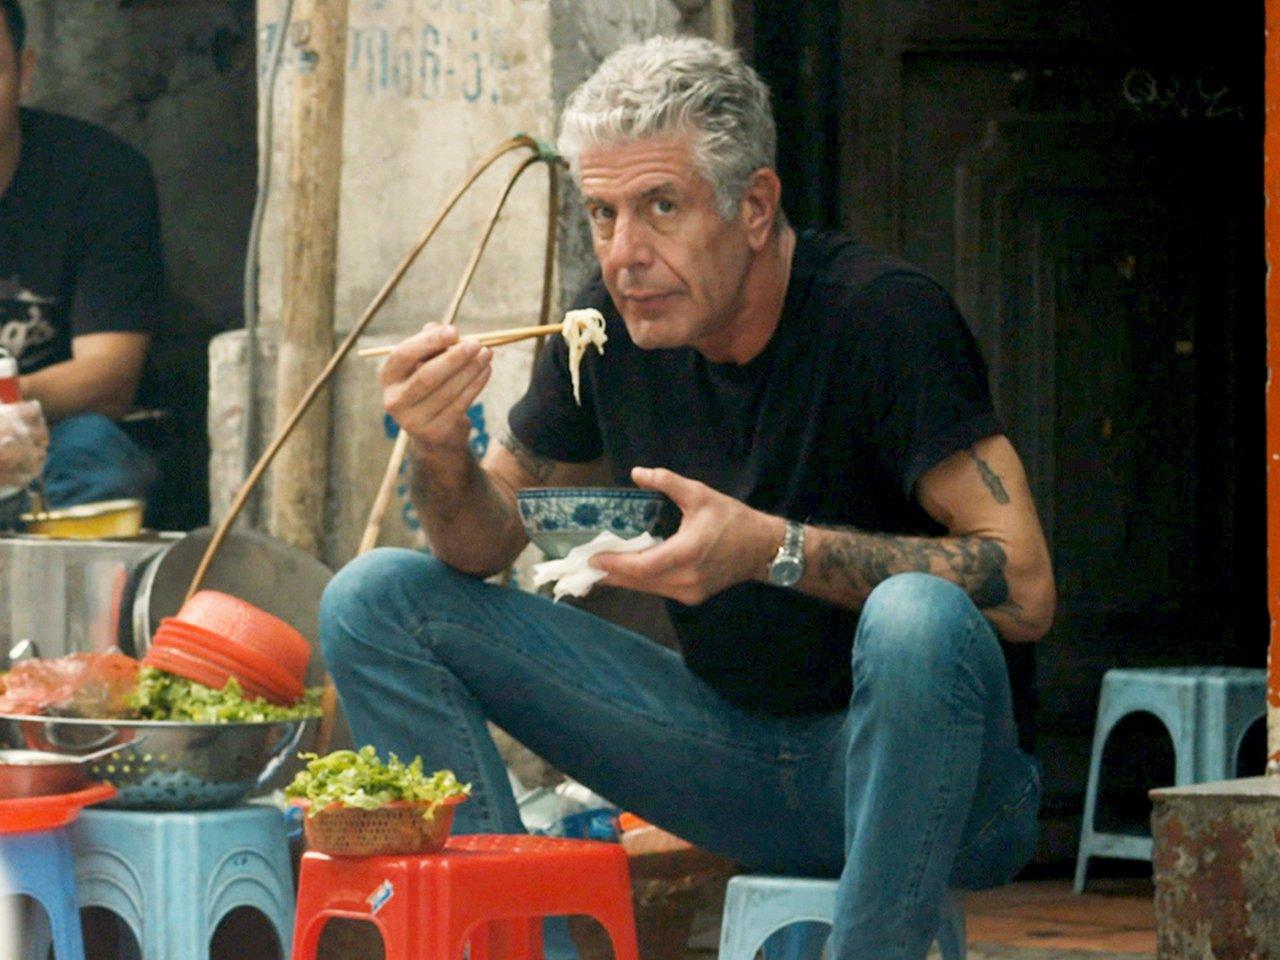 photo of anthony bourdain eating noodles